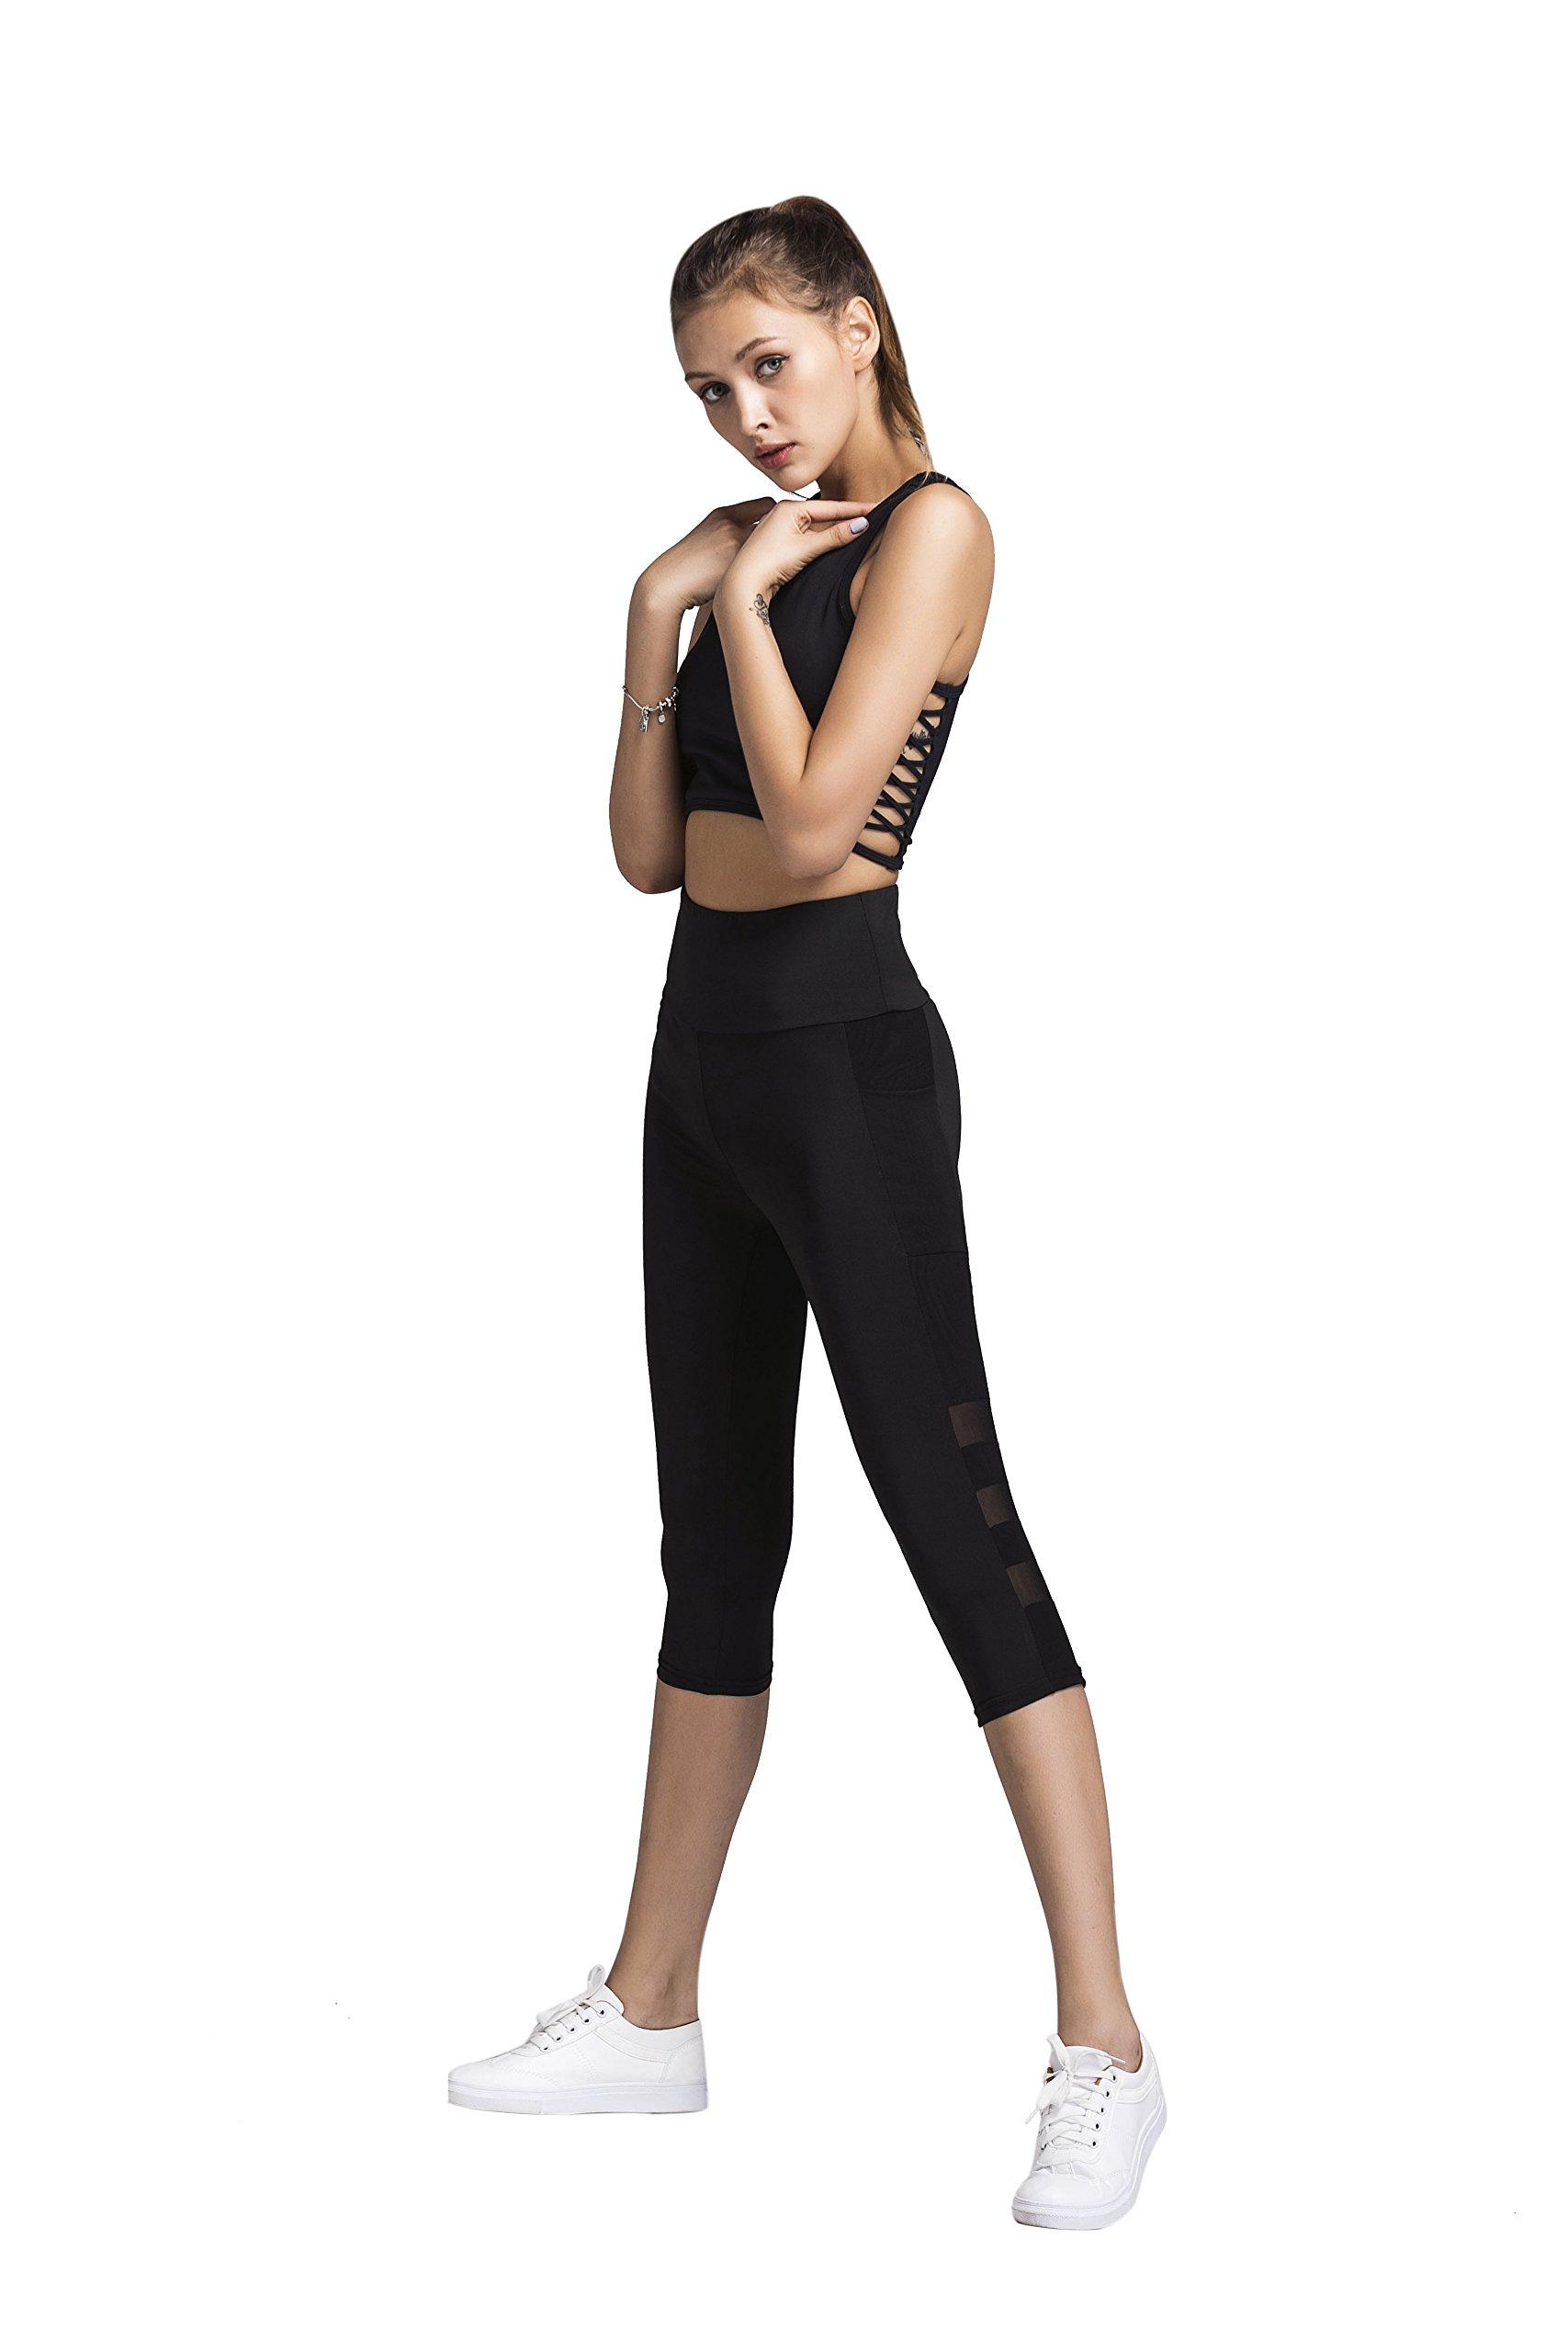 Gymsupply Women\'s Mesh Yoga Capri Pants Sport Tights Workout Running Leggings With Side Pocket Y22(Medium)